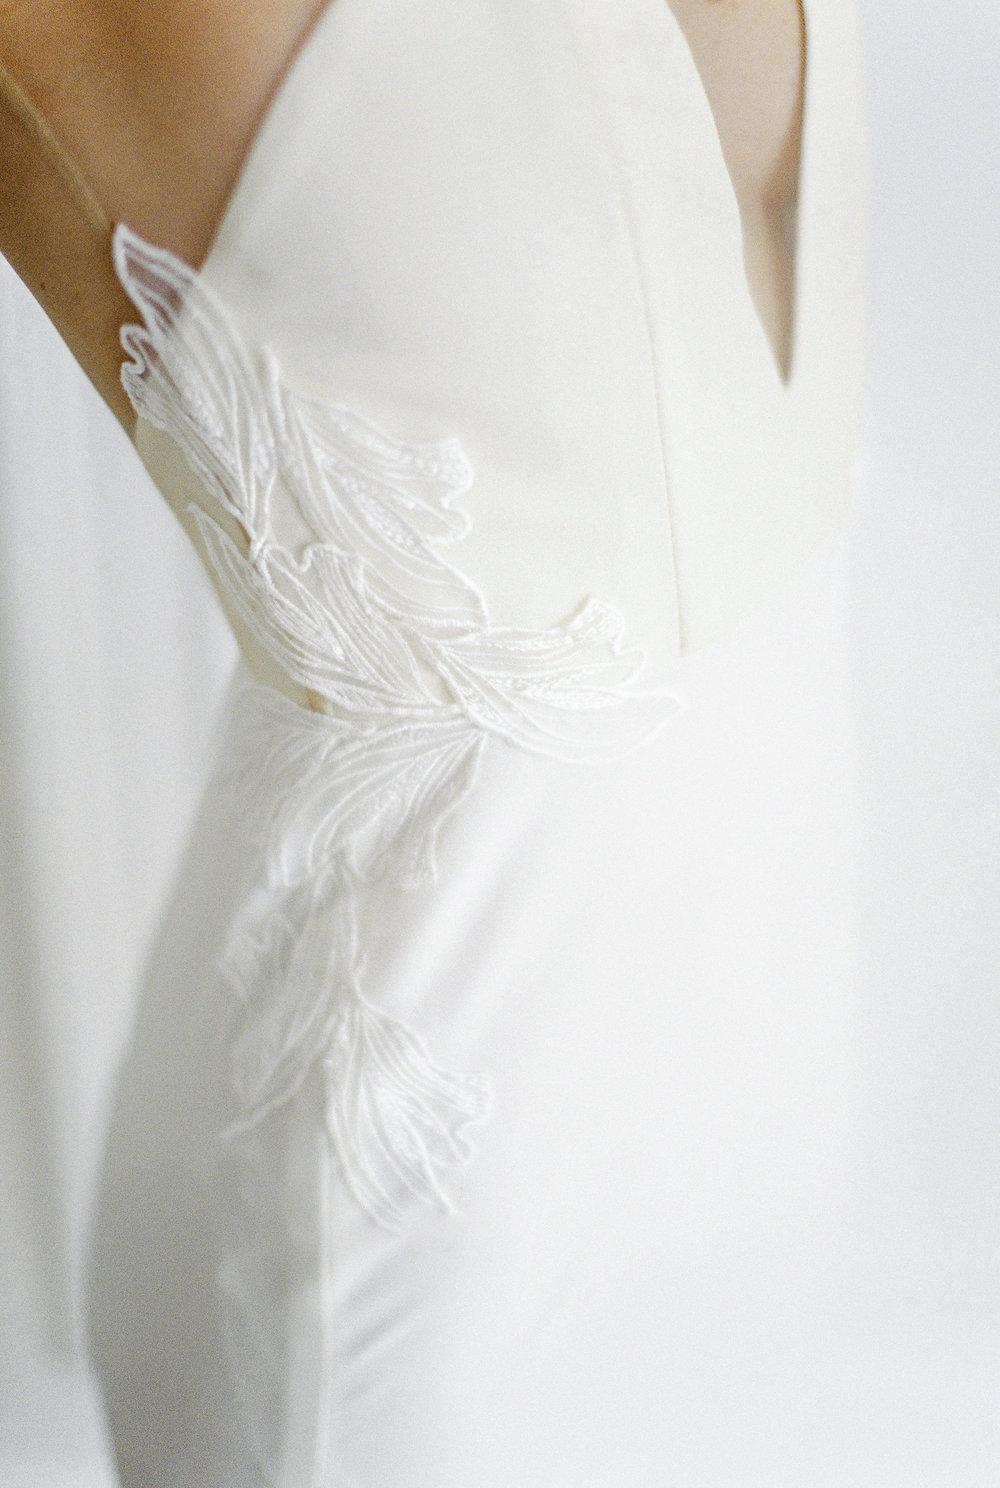 Ludovic Grau-Mingot - Film Photographer - Talitha - Wedding dresses - Collection 2019-301.jpg